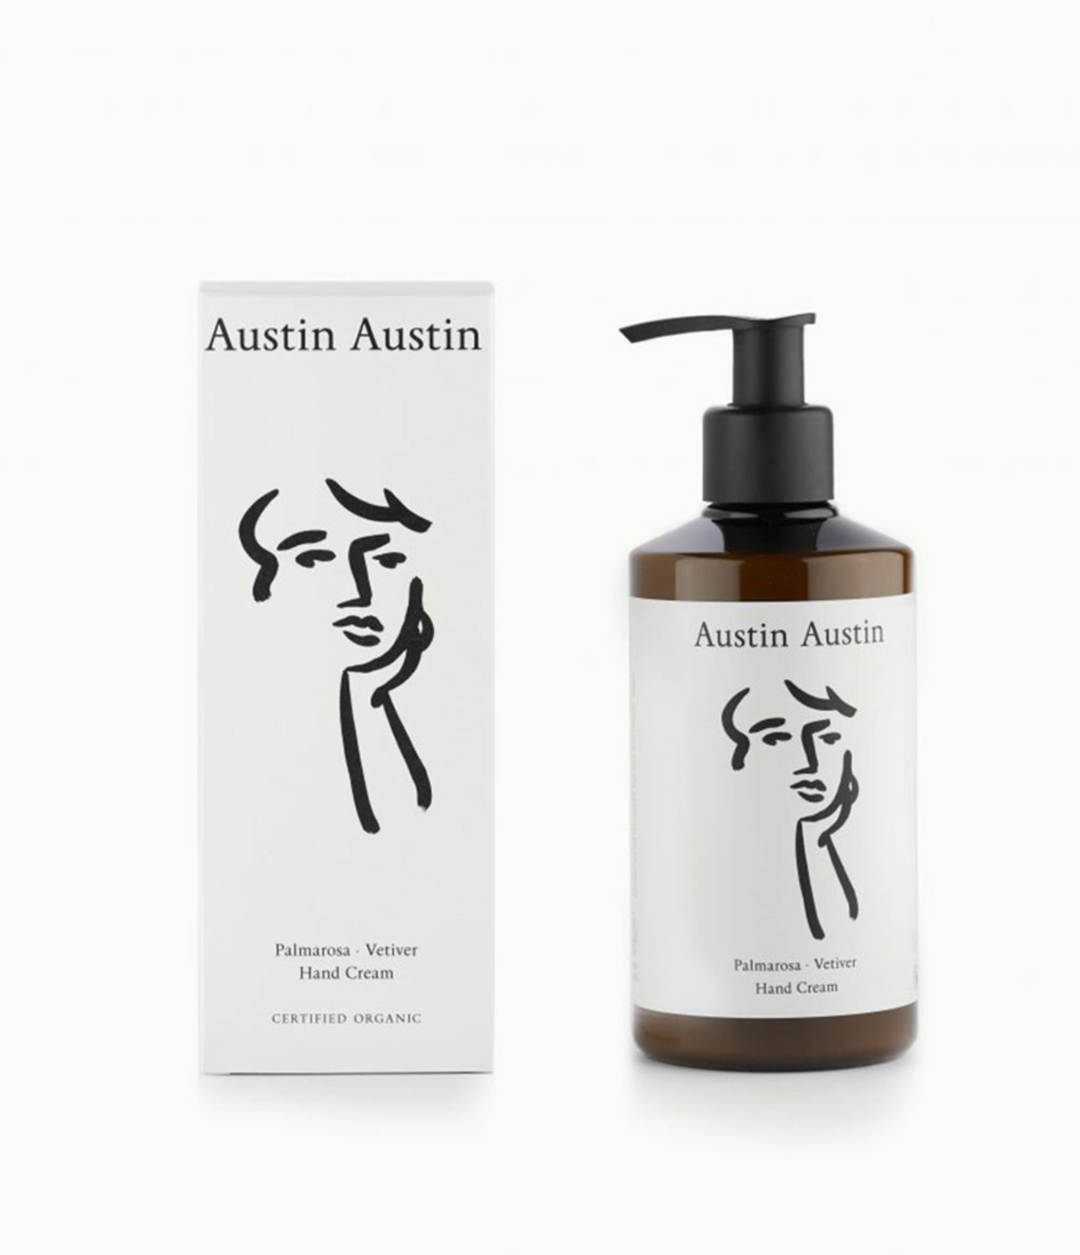 austin-austin-hand-cream